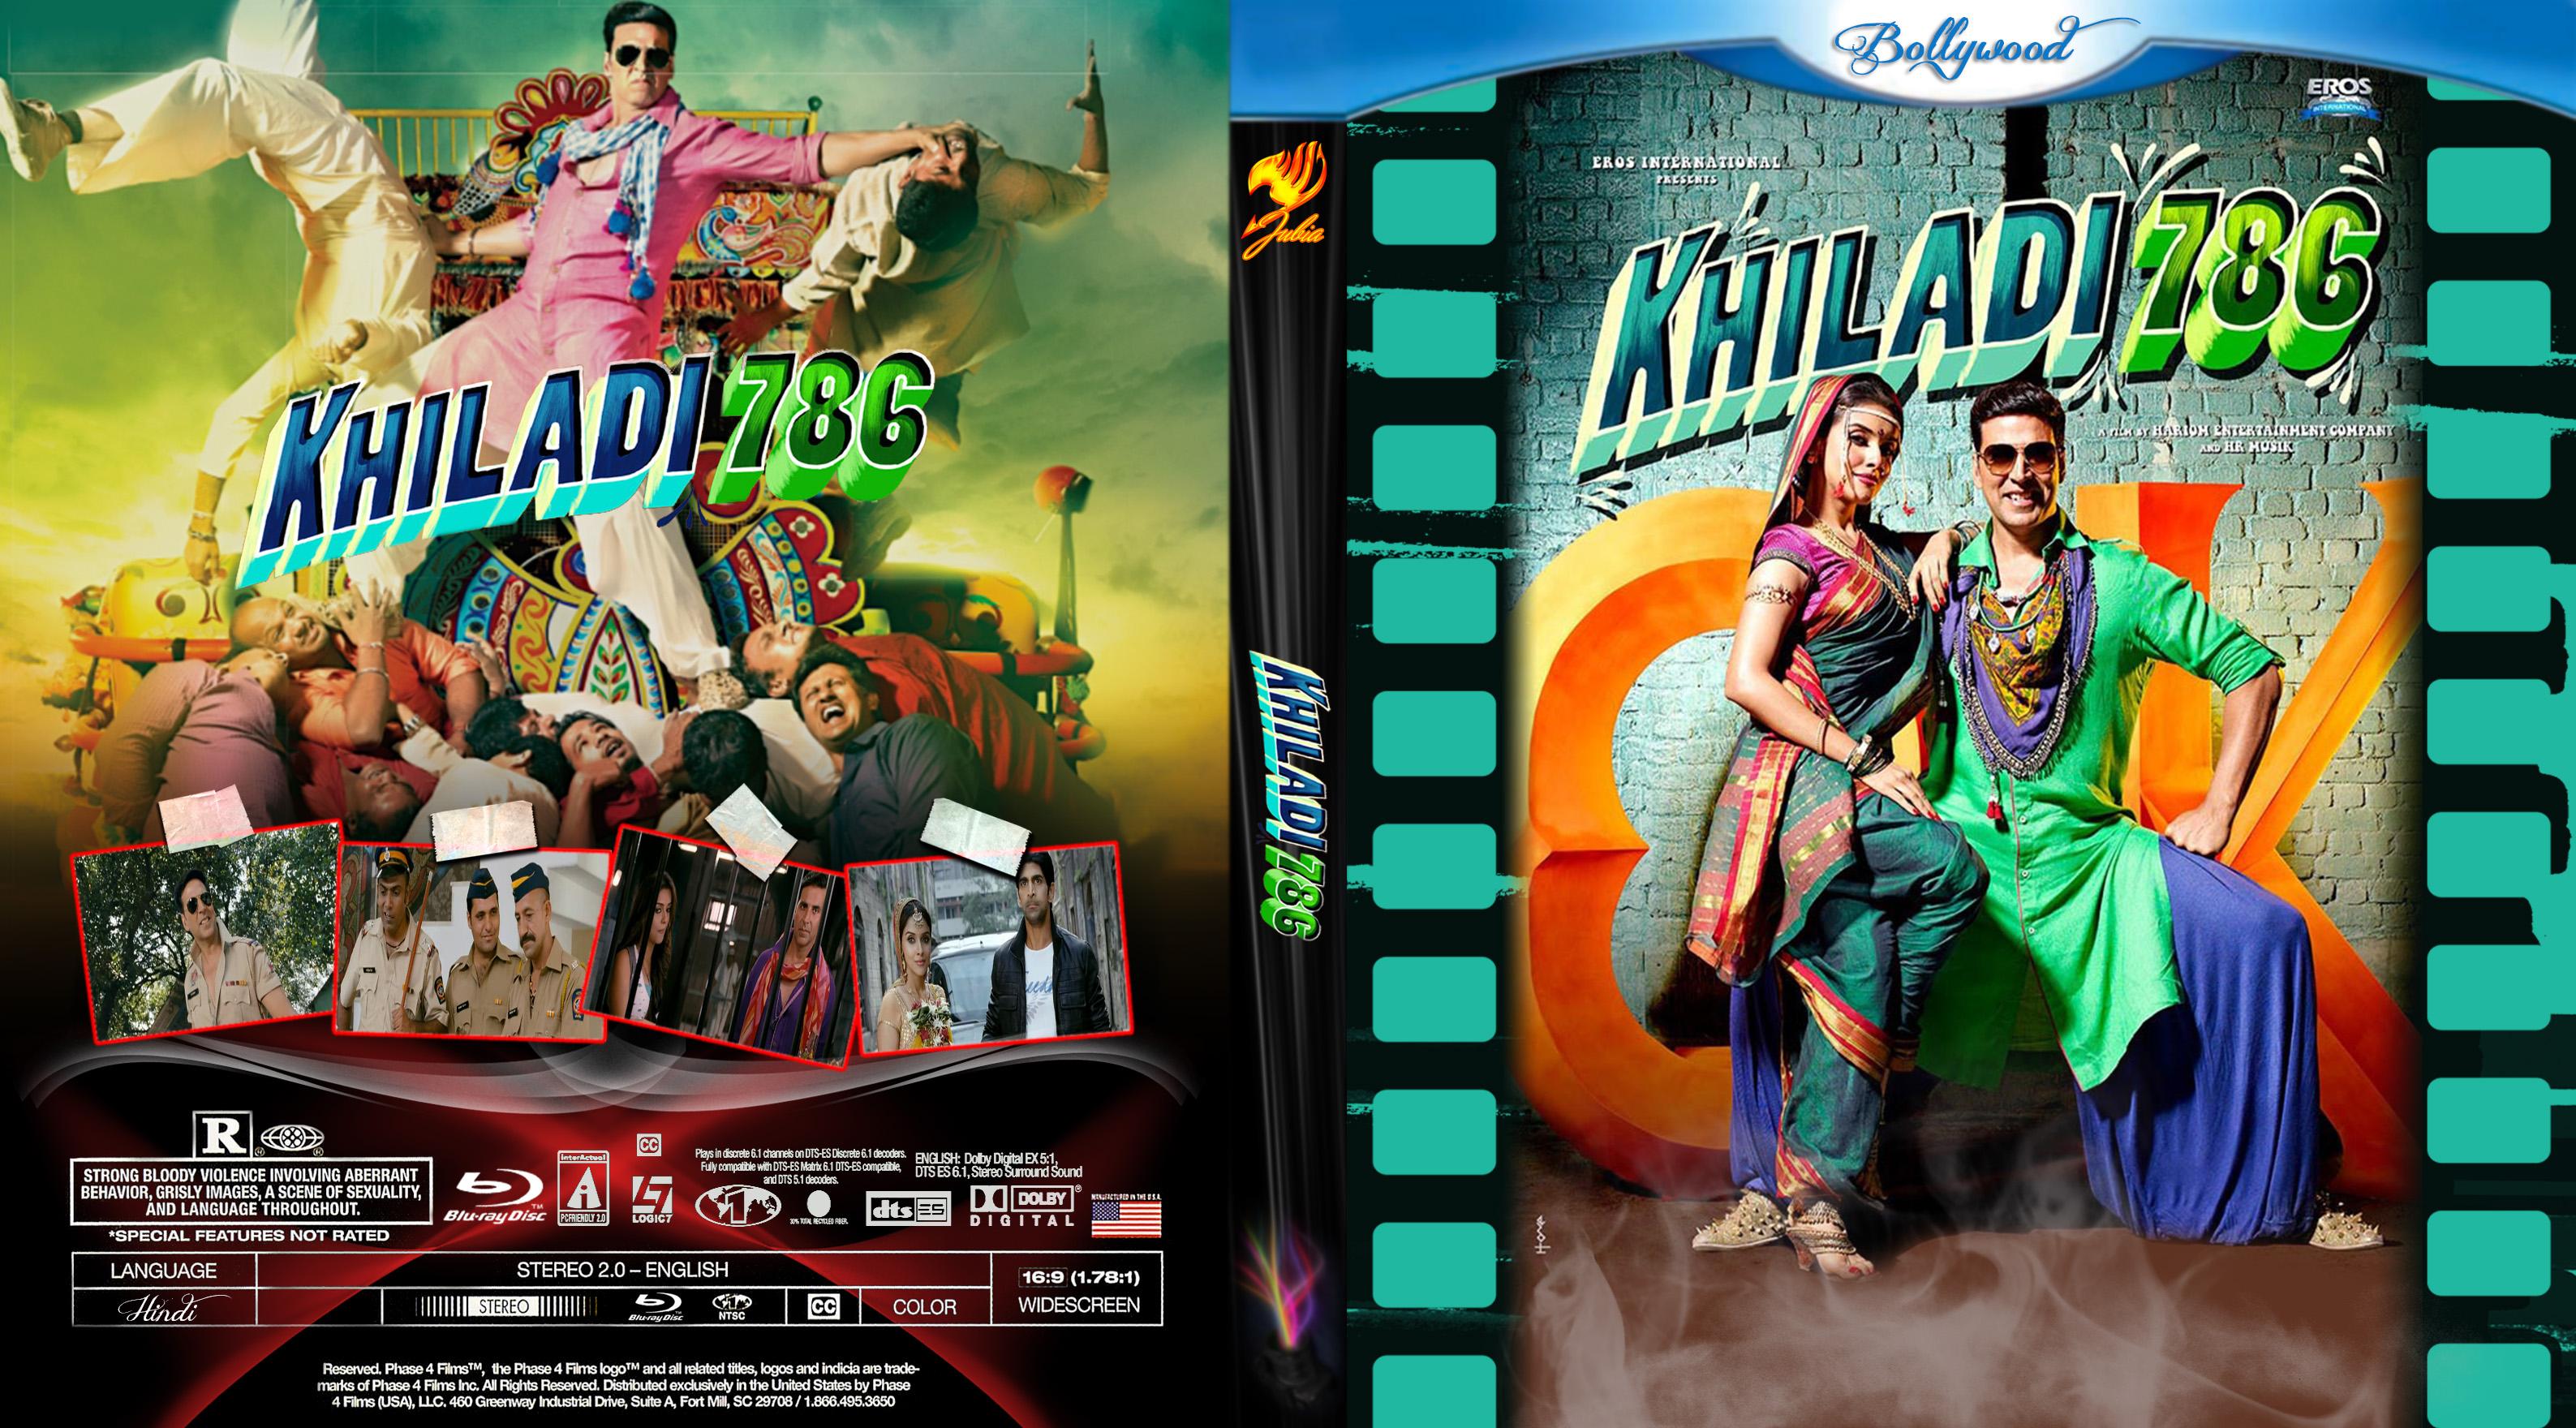 Covers Box Sk Khiladi 786 2013 High Quality Dvd Blueray